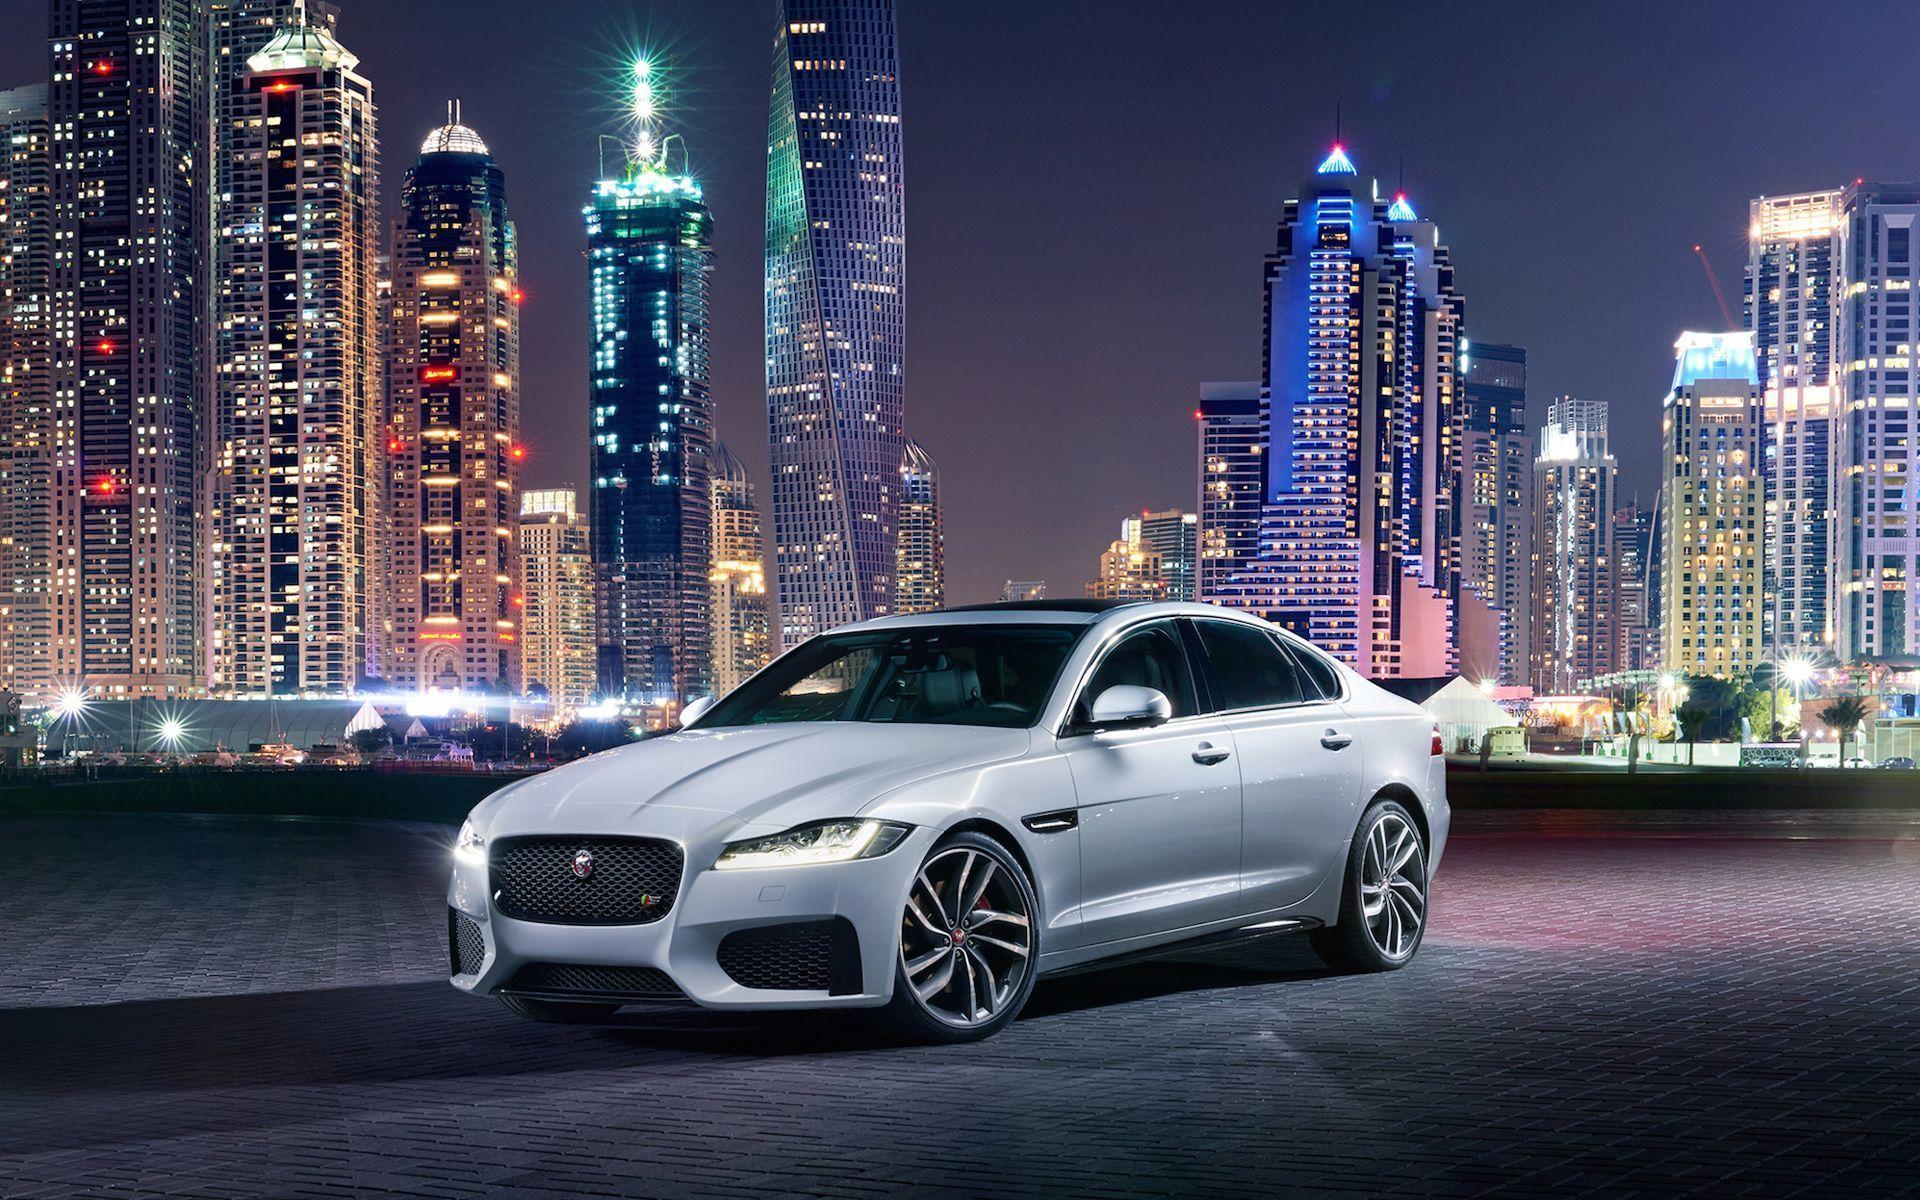 Jaguar Xf Wallpapers Top Free Jaguar Xf Backgrounds Wallpaperaccess